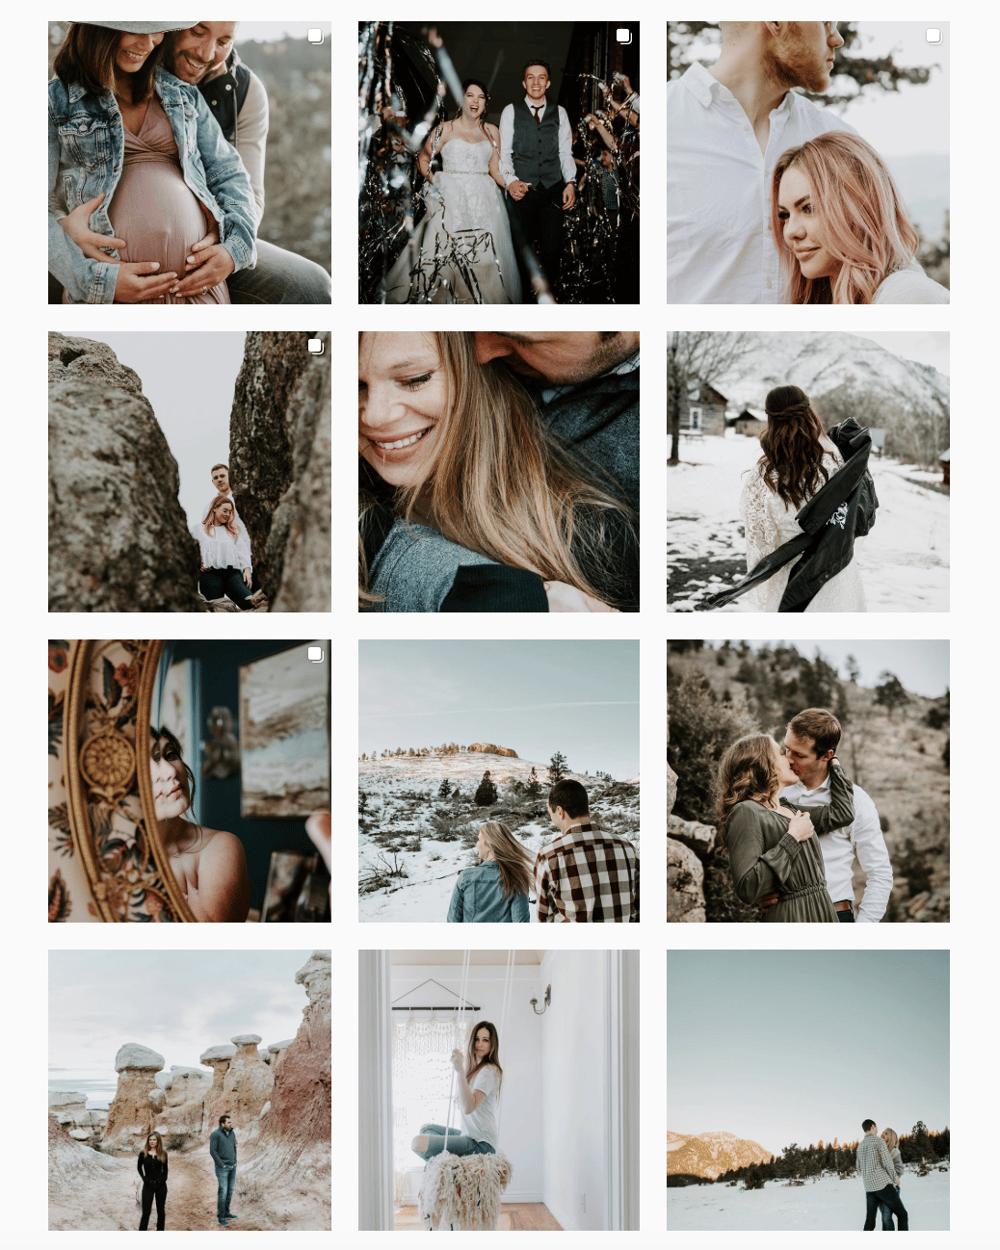 Colorado Wedding + Travel Photographer - image 2 - student project